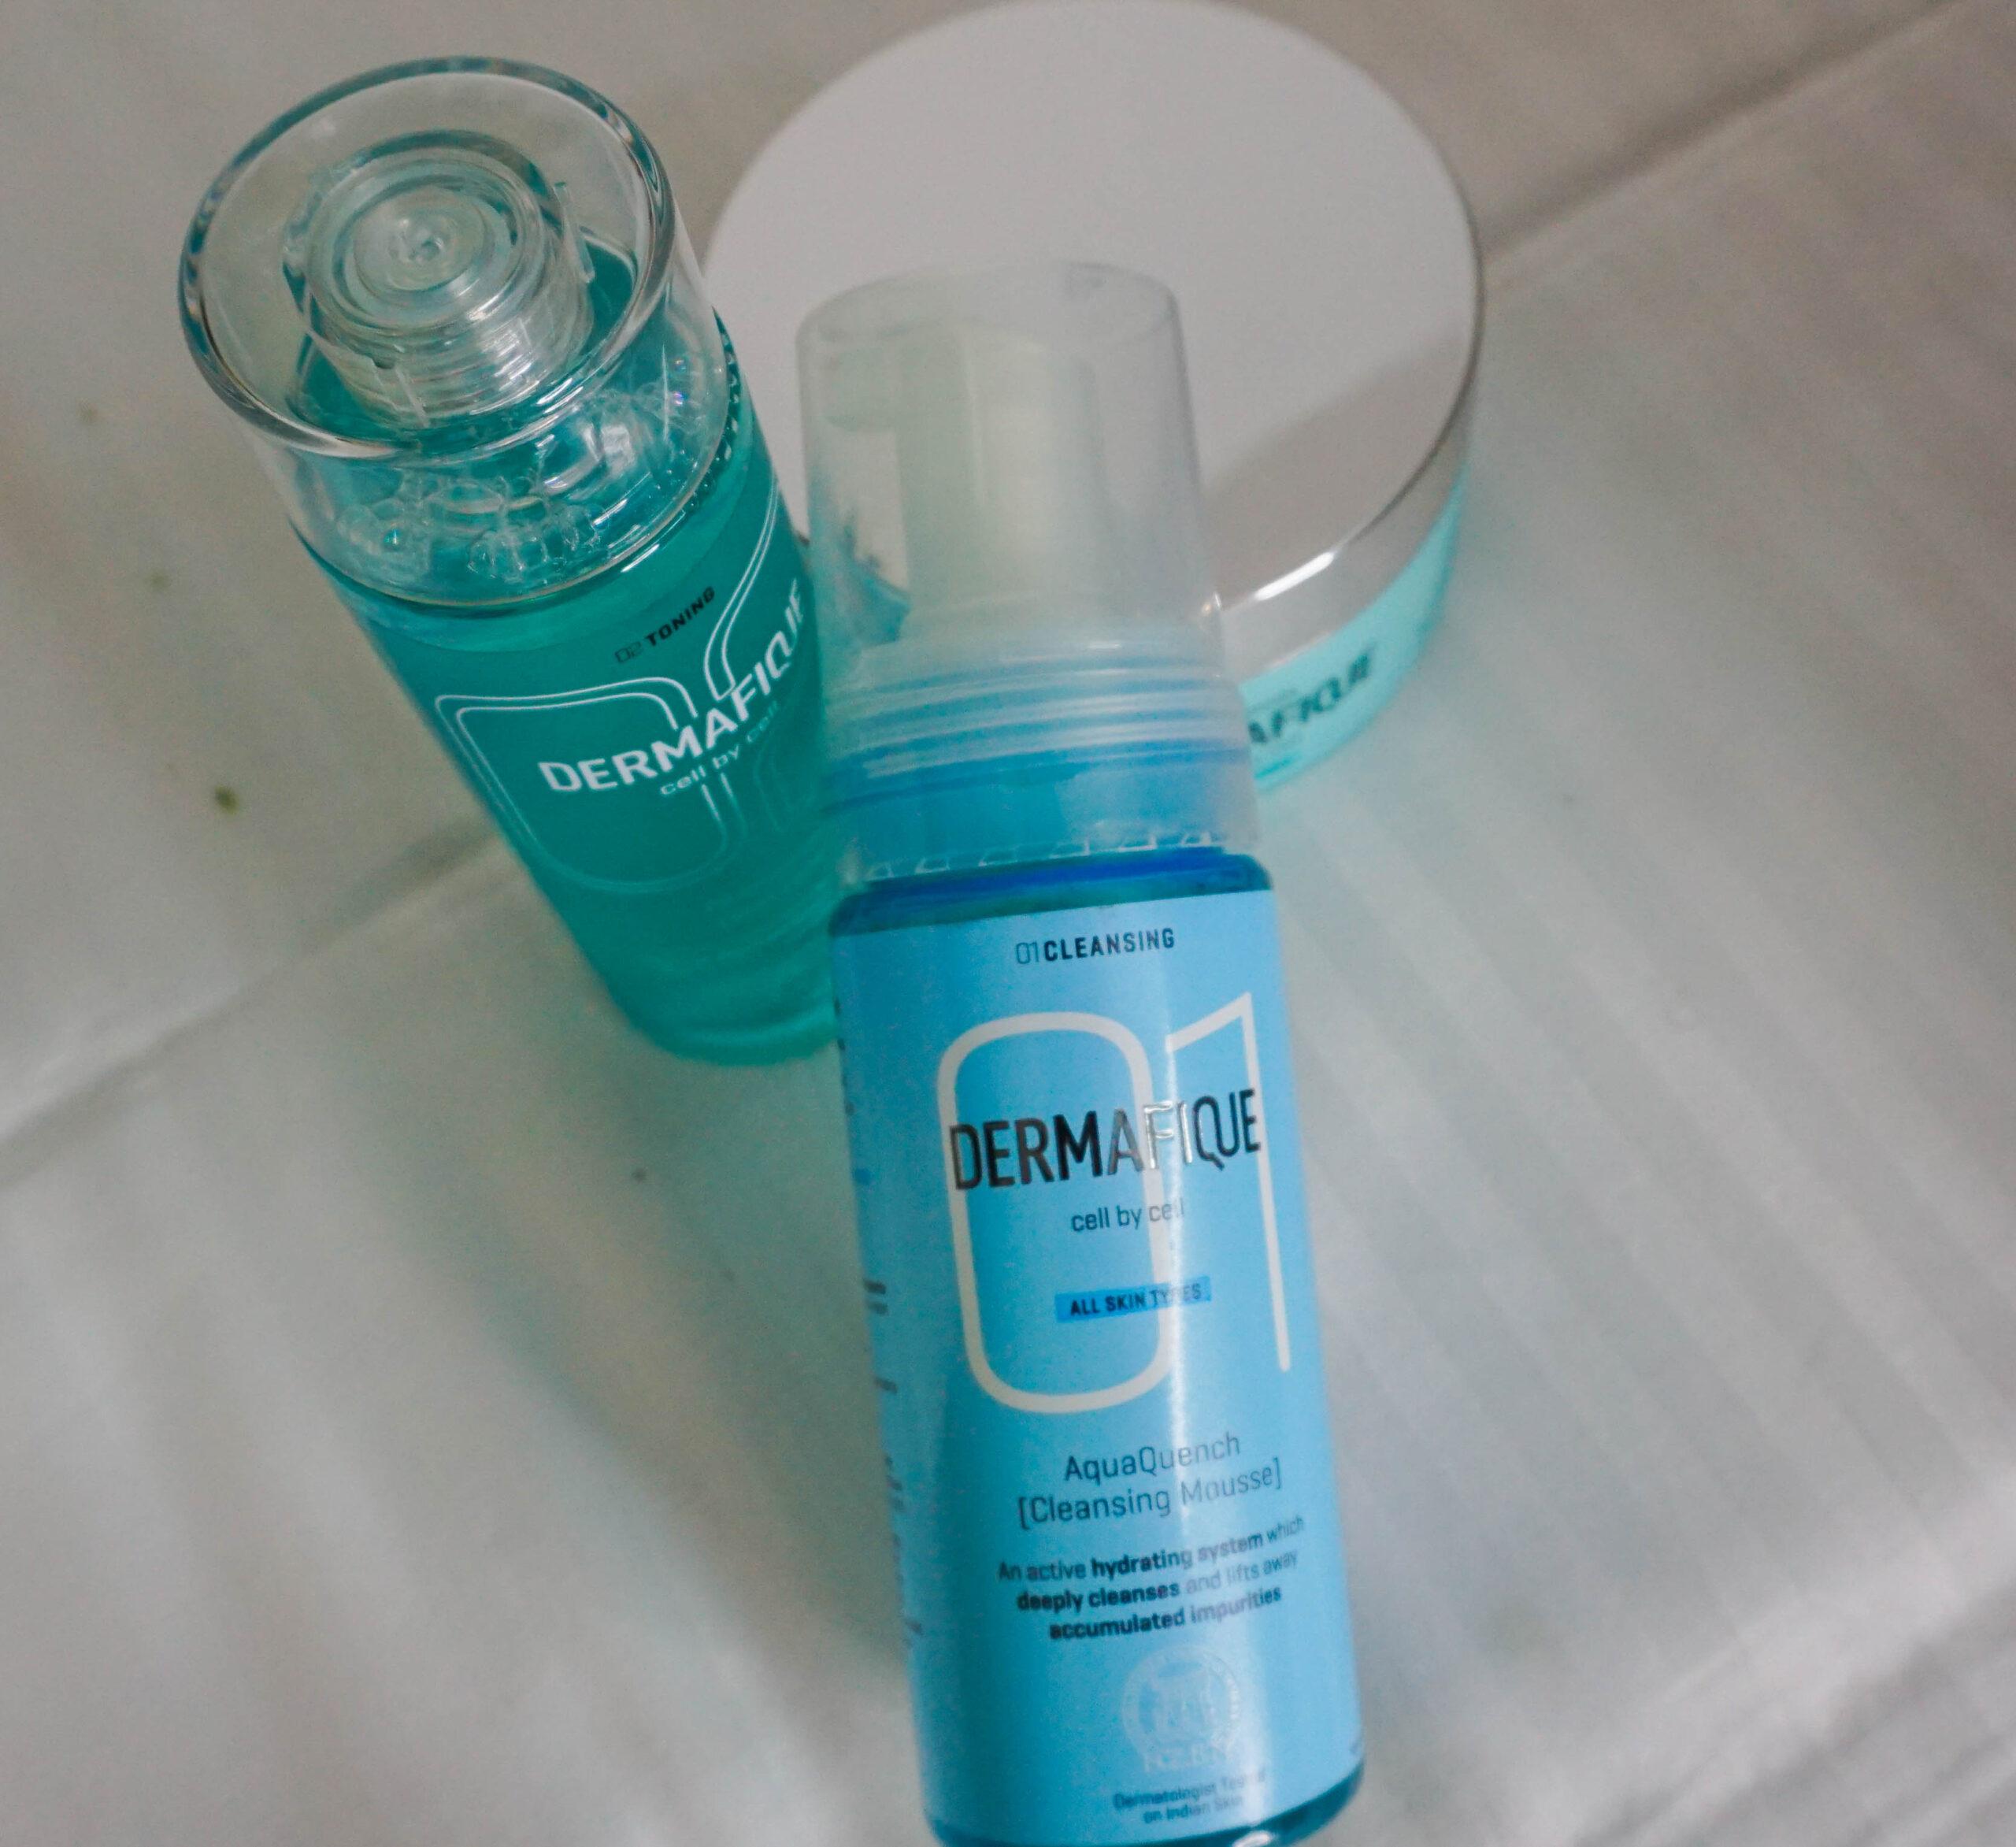 Dermafique's New Skincare Range Made Me Reconsider My Skincare Routine